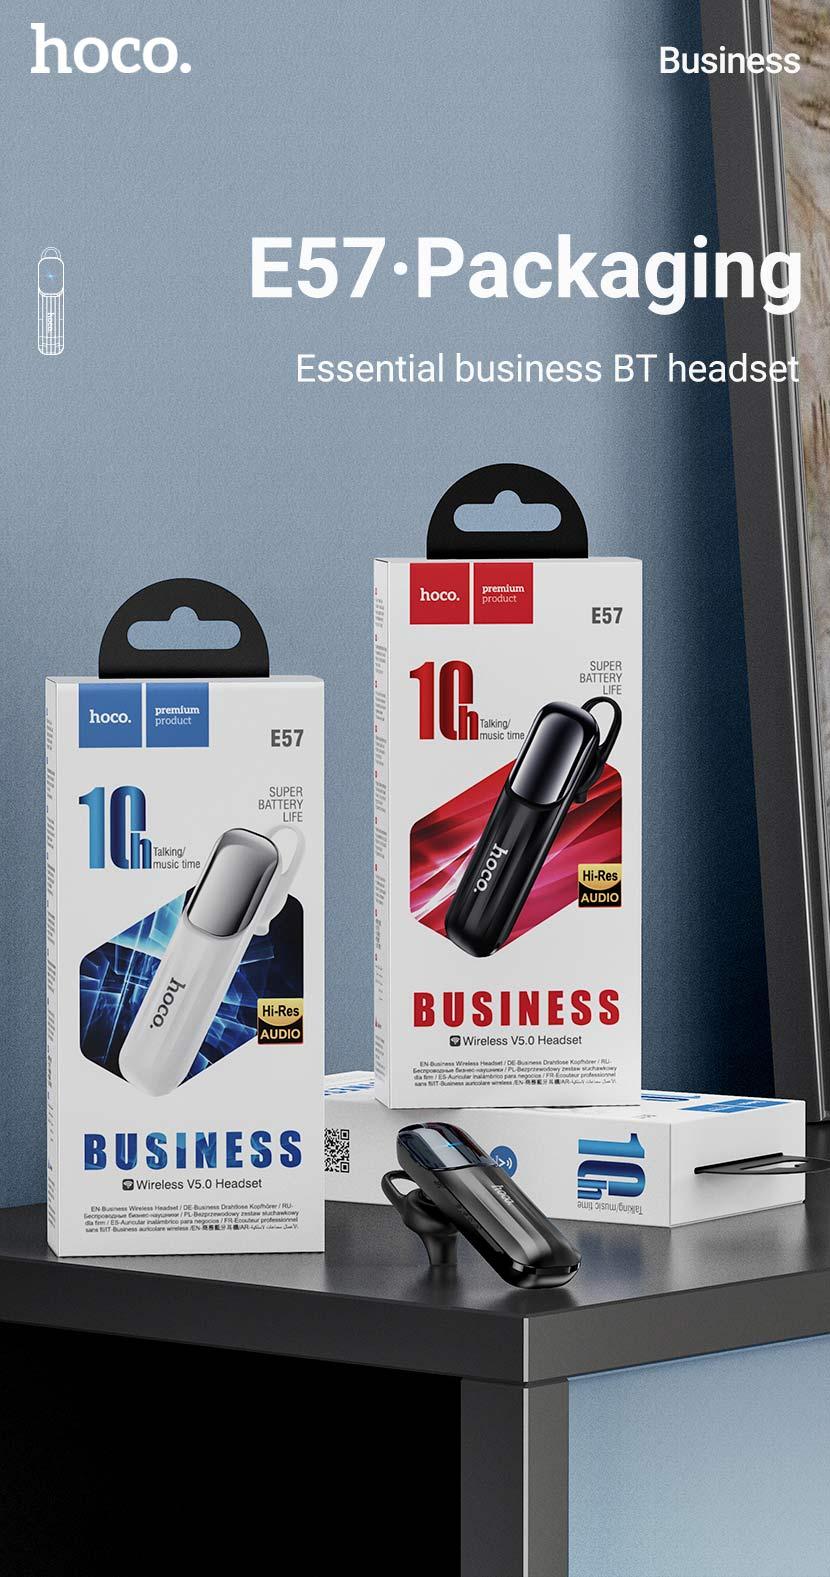 hoco news e57 essential business bt headset package en